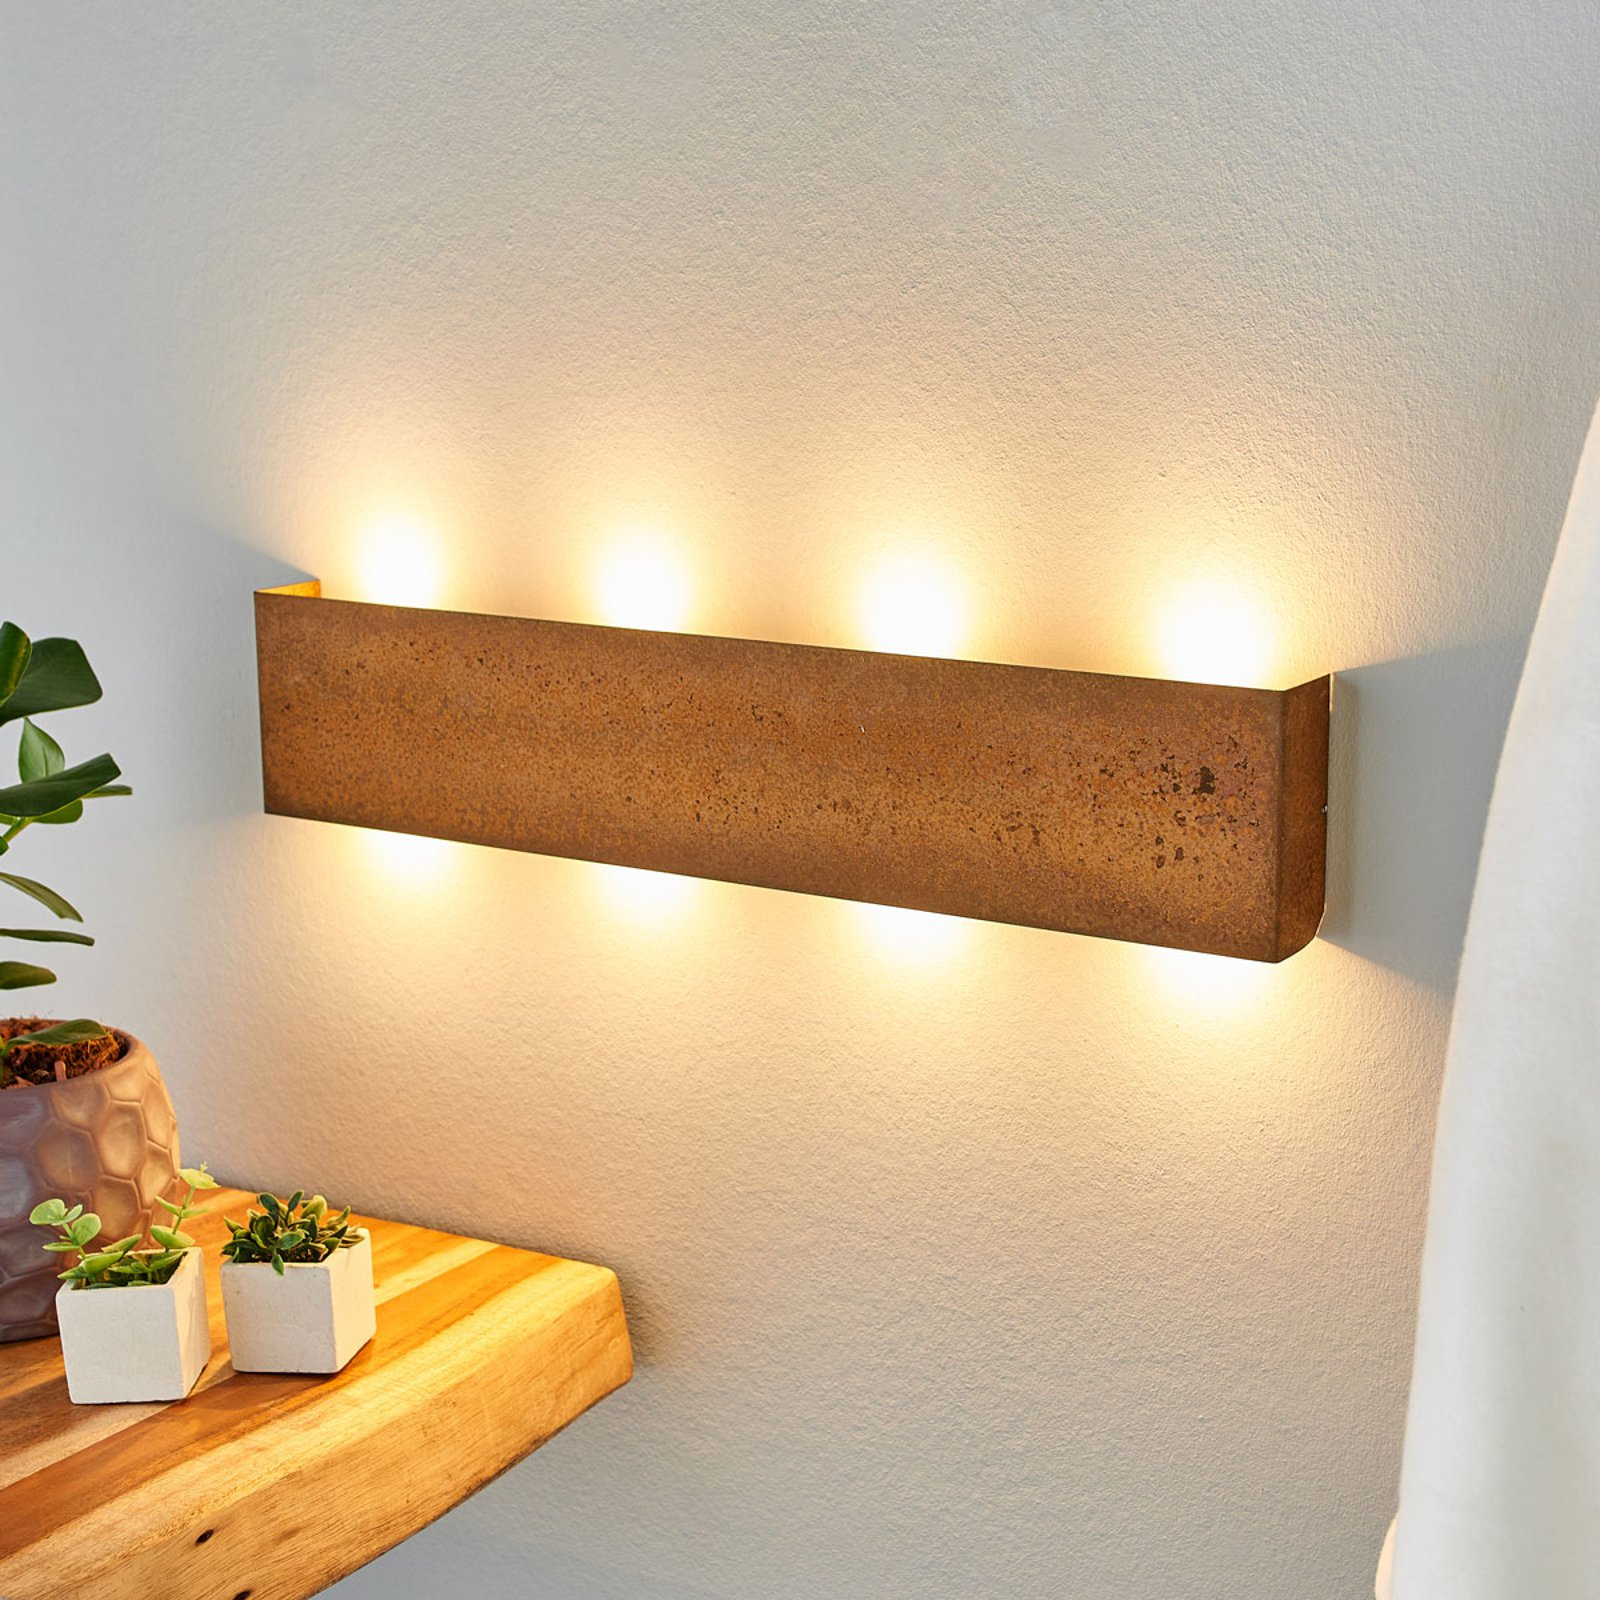 Maja – dimbar LED-vegglampe med rustoverflate